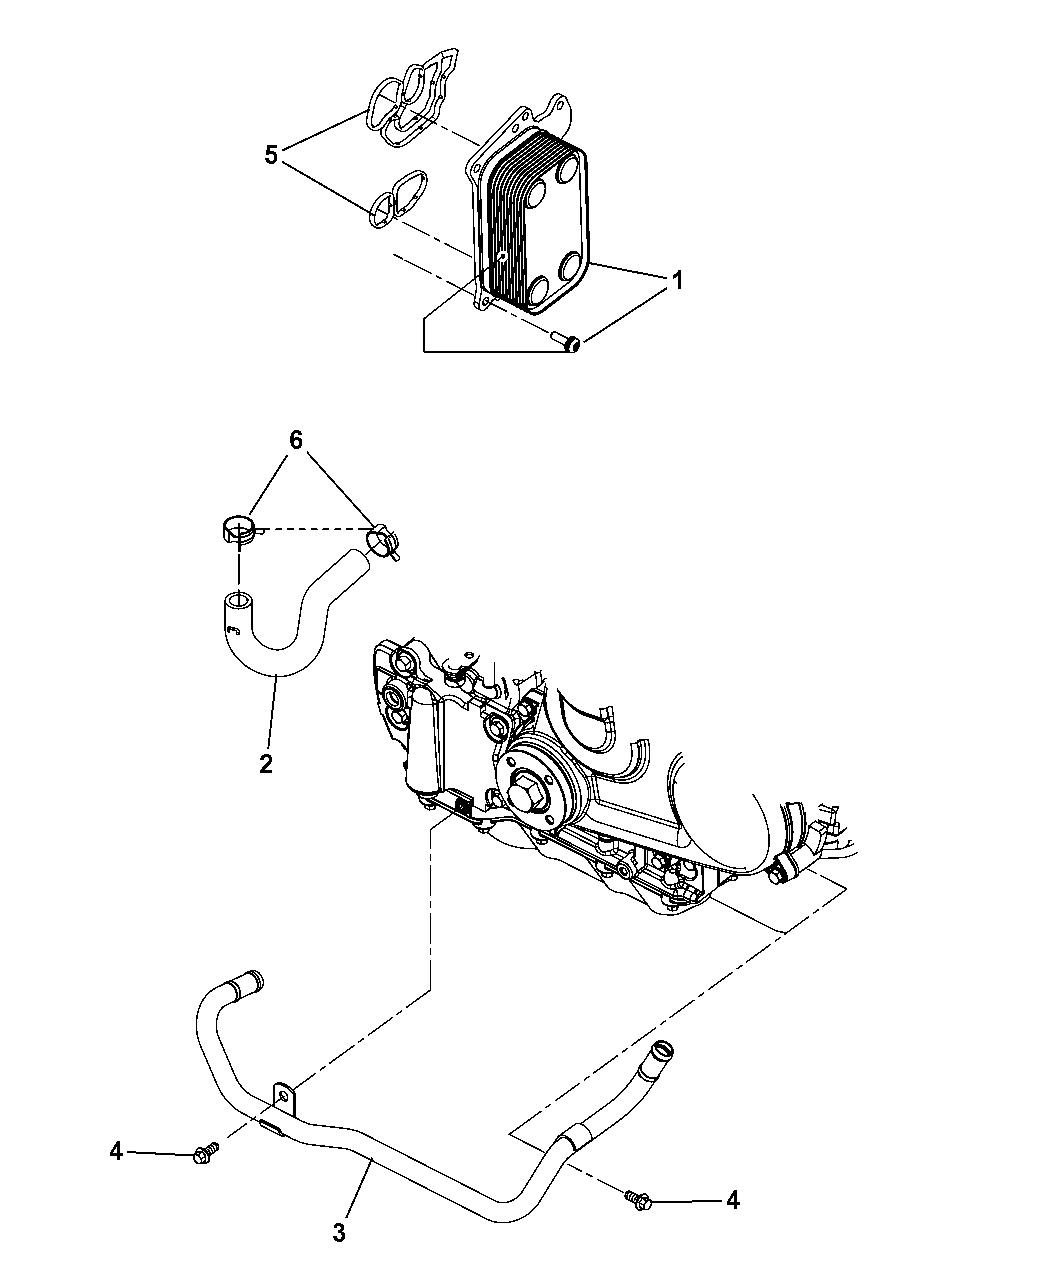 2008 jeep wrangler engine diagram